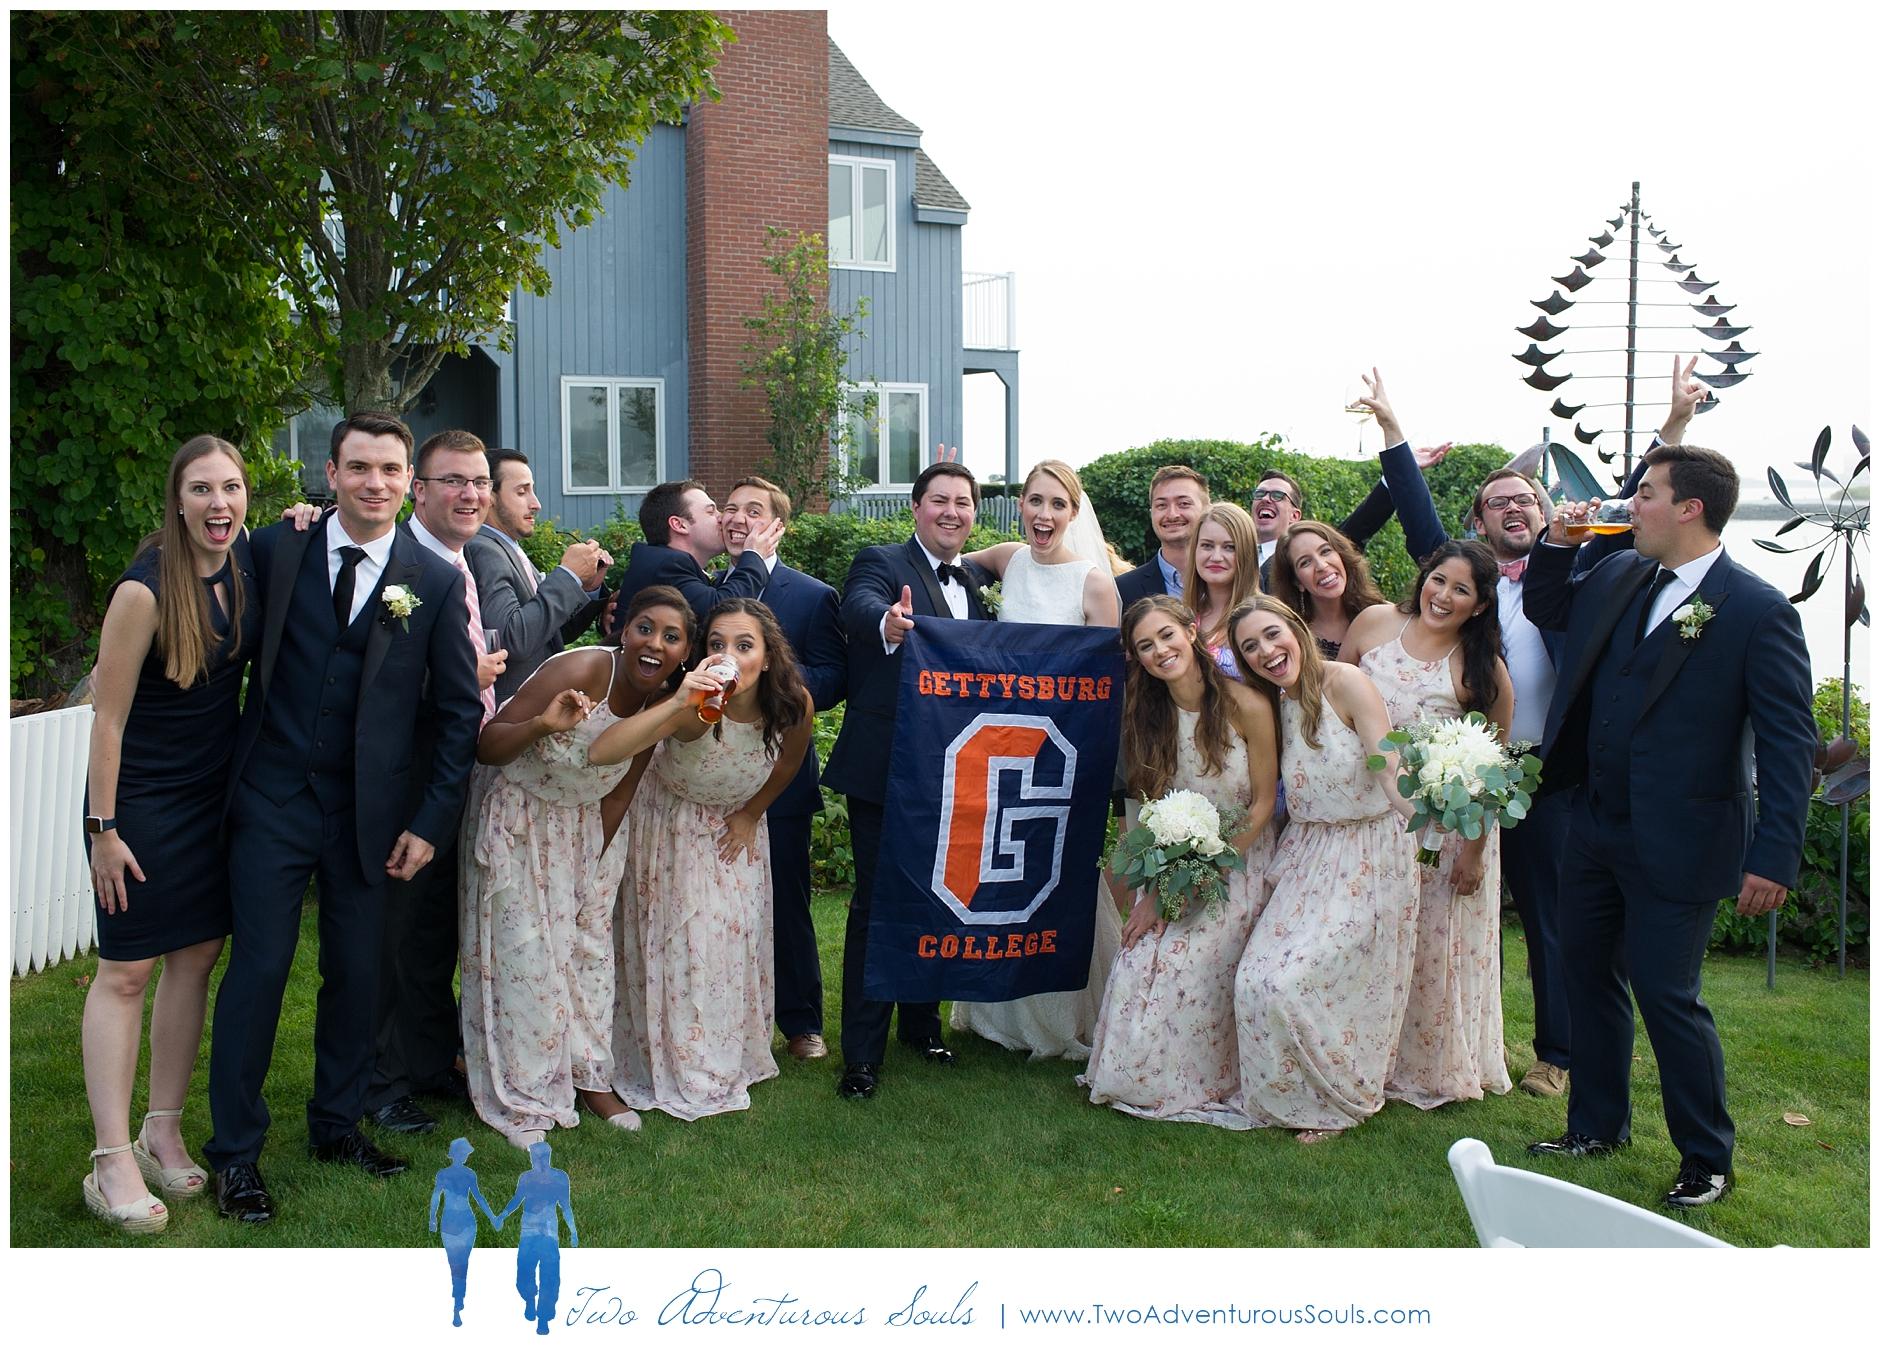 Breakwater Inn and Spa Wedding, Kennebunkport Wedding, Maine Wedding - Gettysburg College Wedding